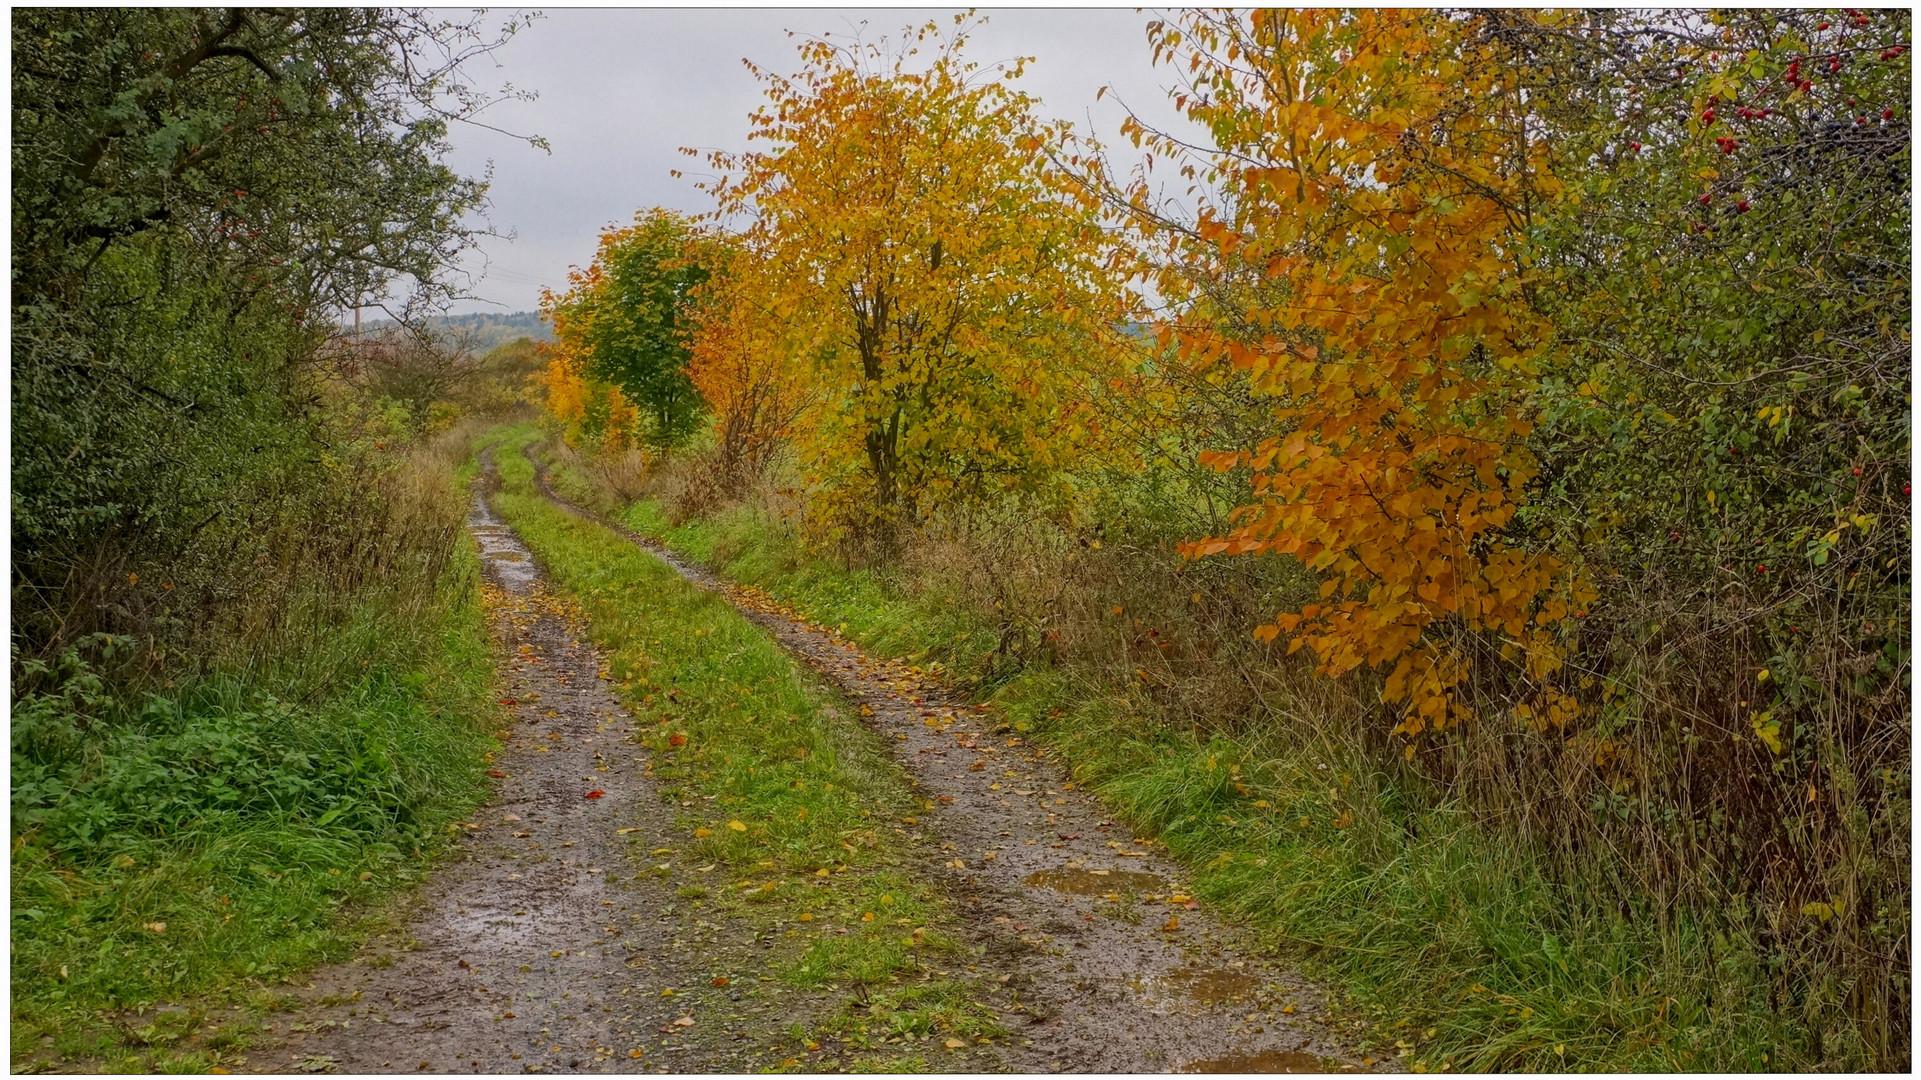 Weg zum See II (camino al lago II)